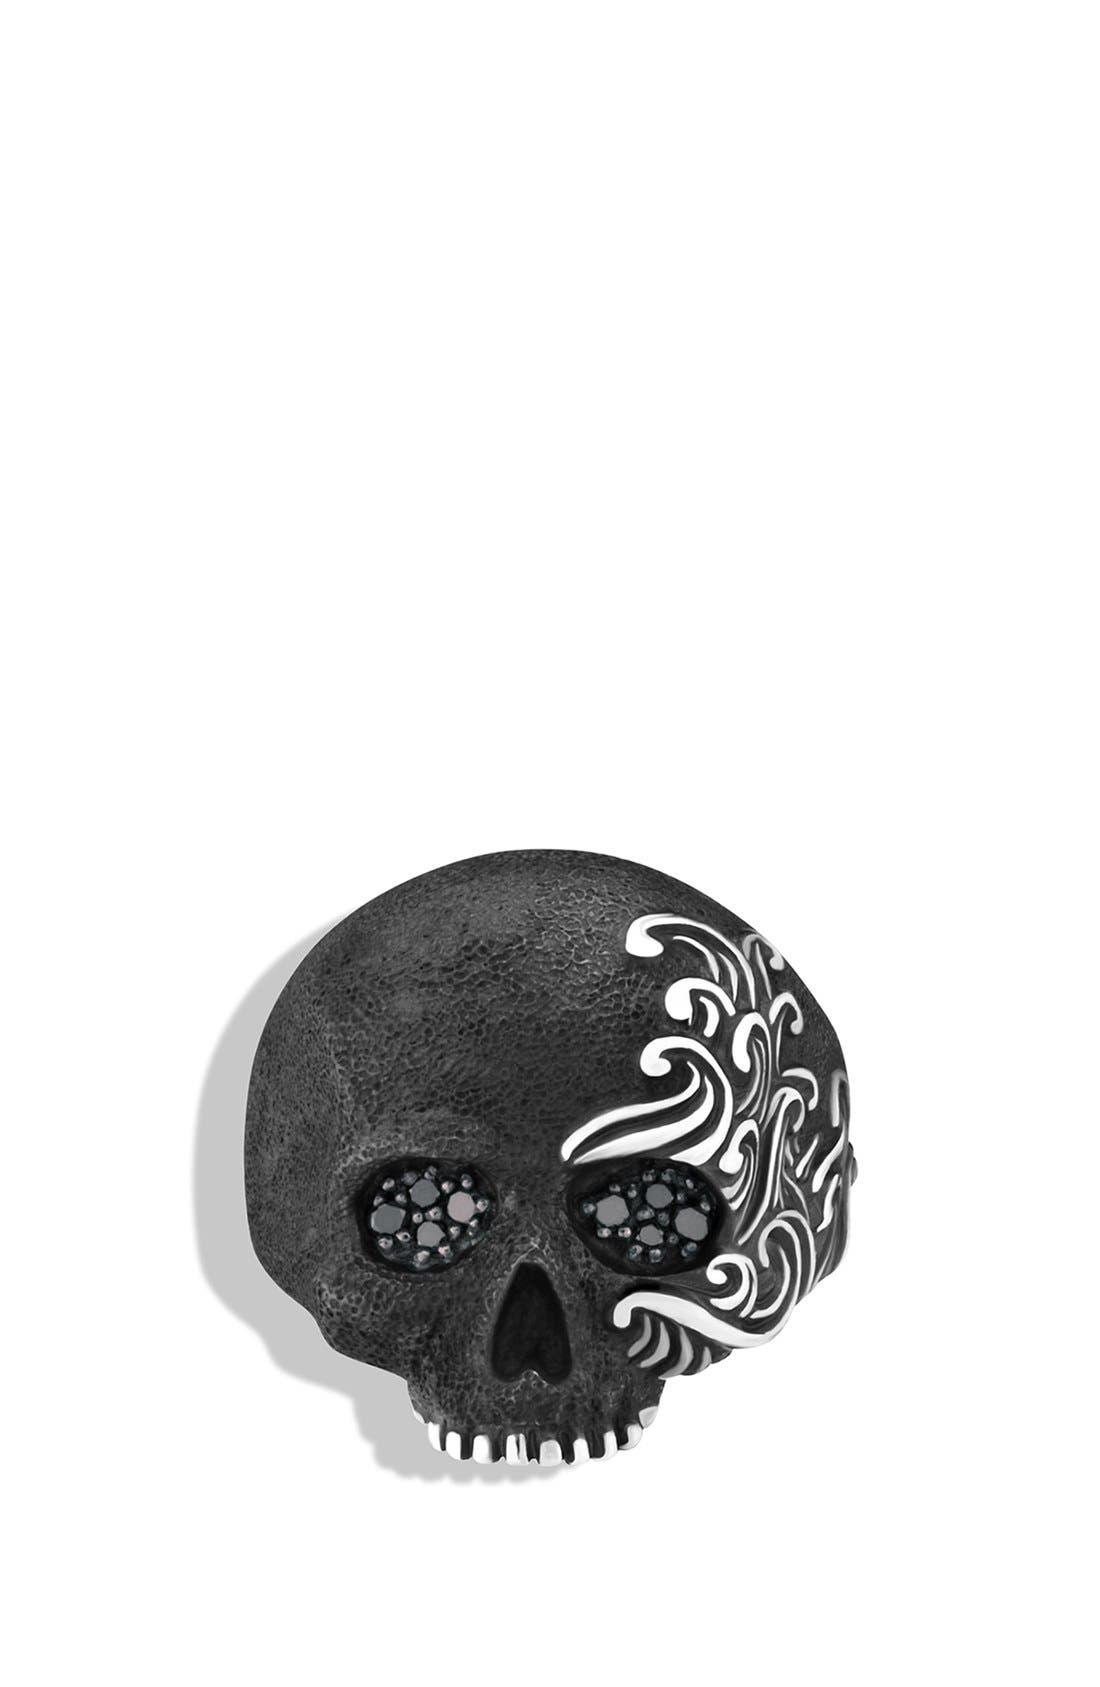 'Waves' Large Skull Ring with Black Diamonds,                             Alternate thumbnail 5, color,                             BLACK DIAMOND